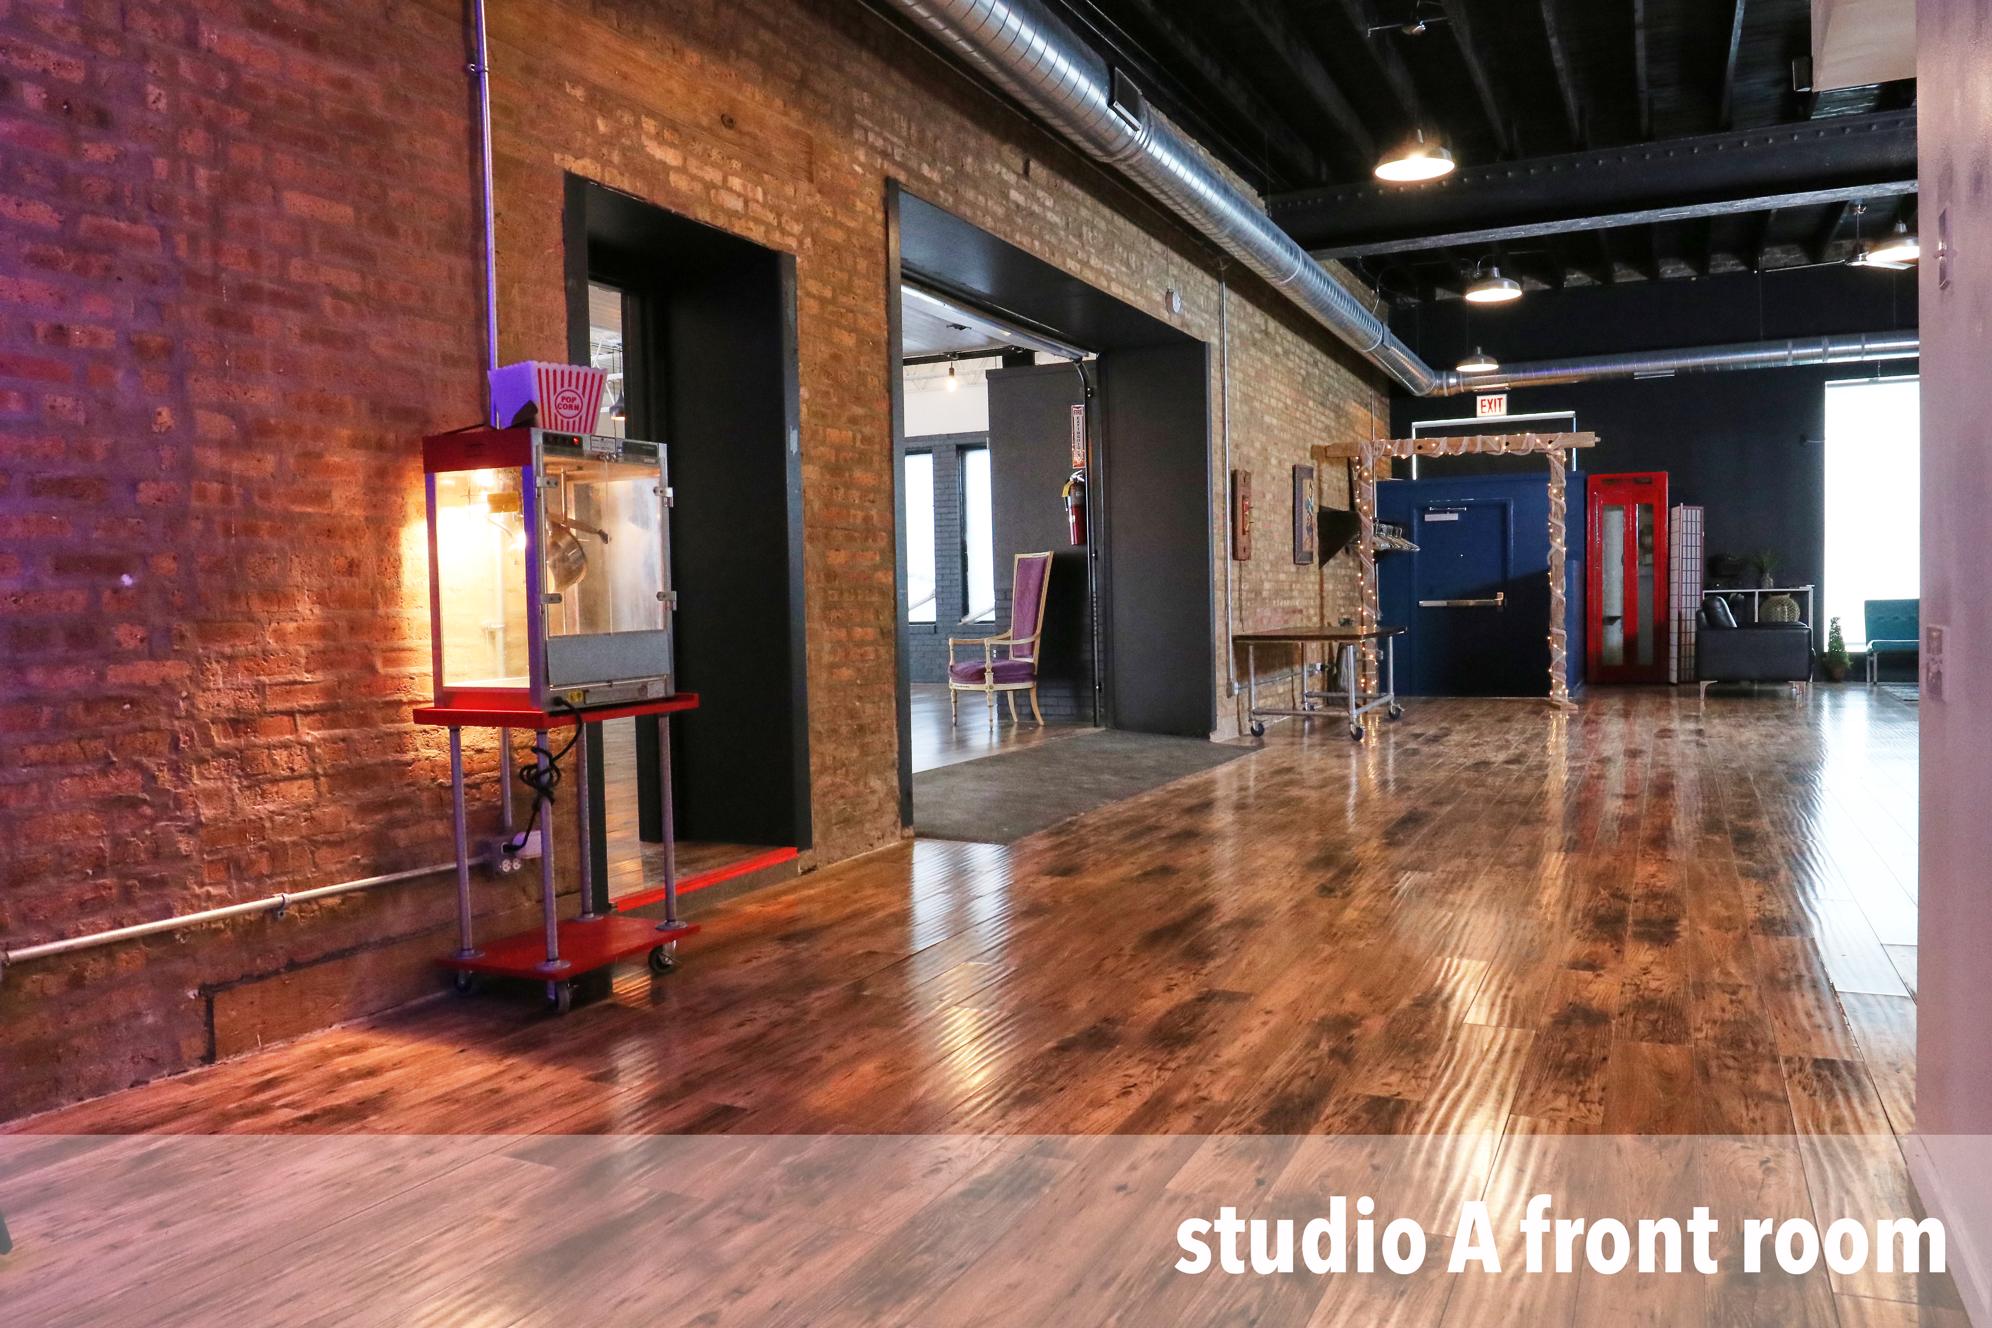 studio-A-front-room-5.png